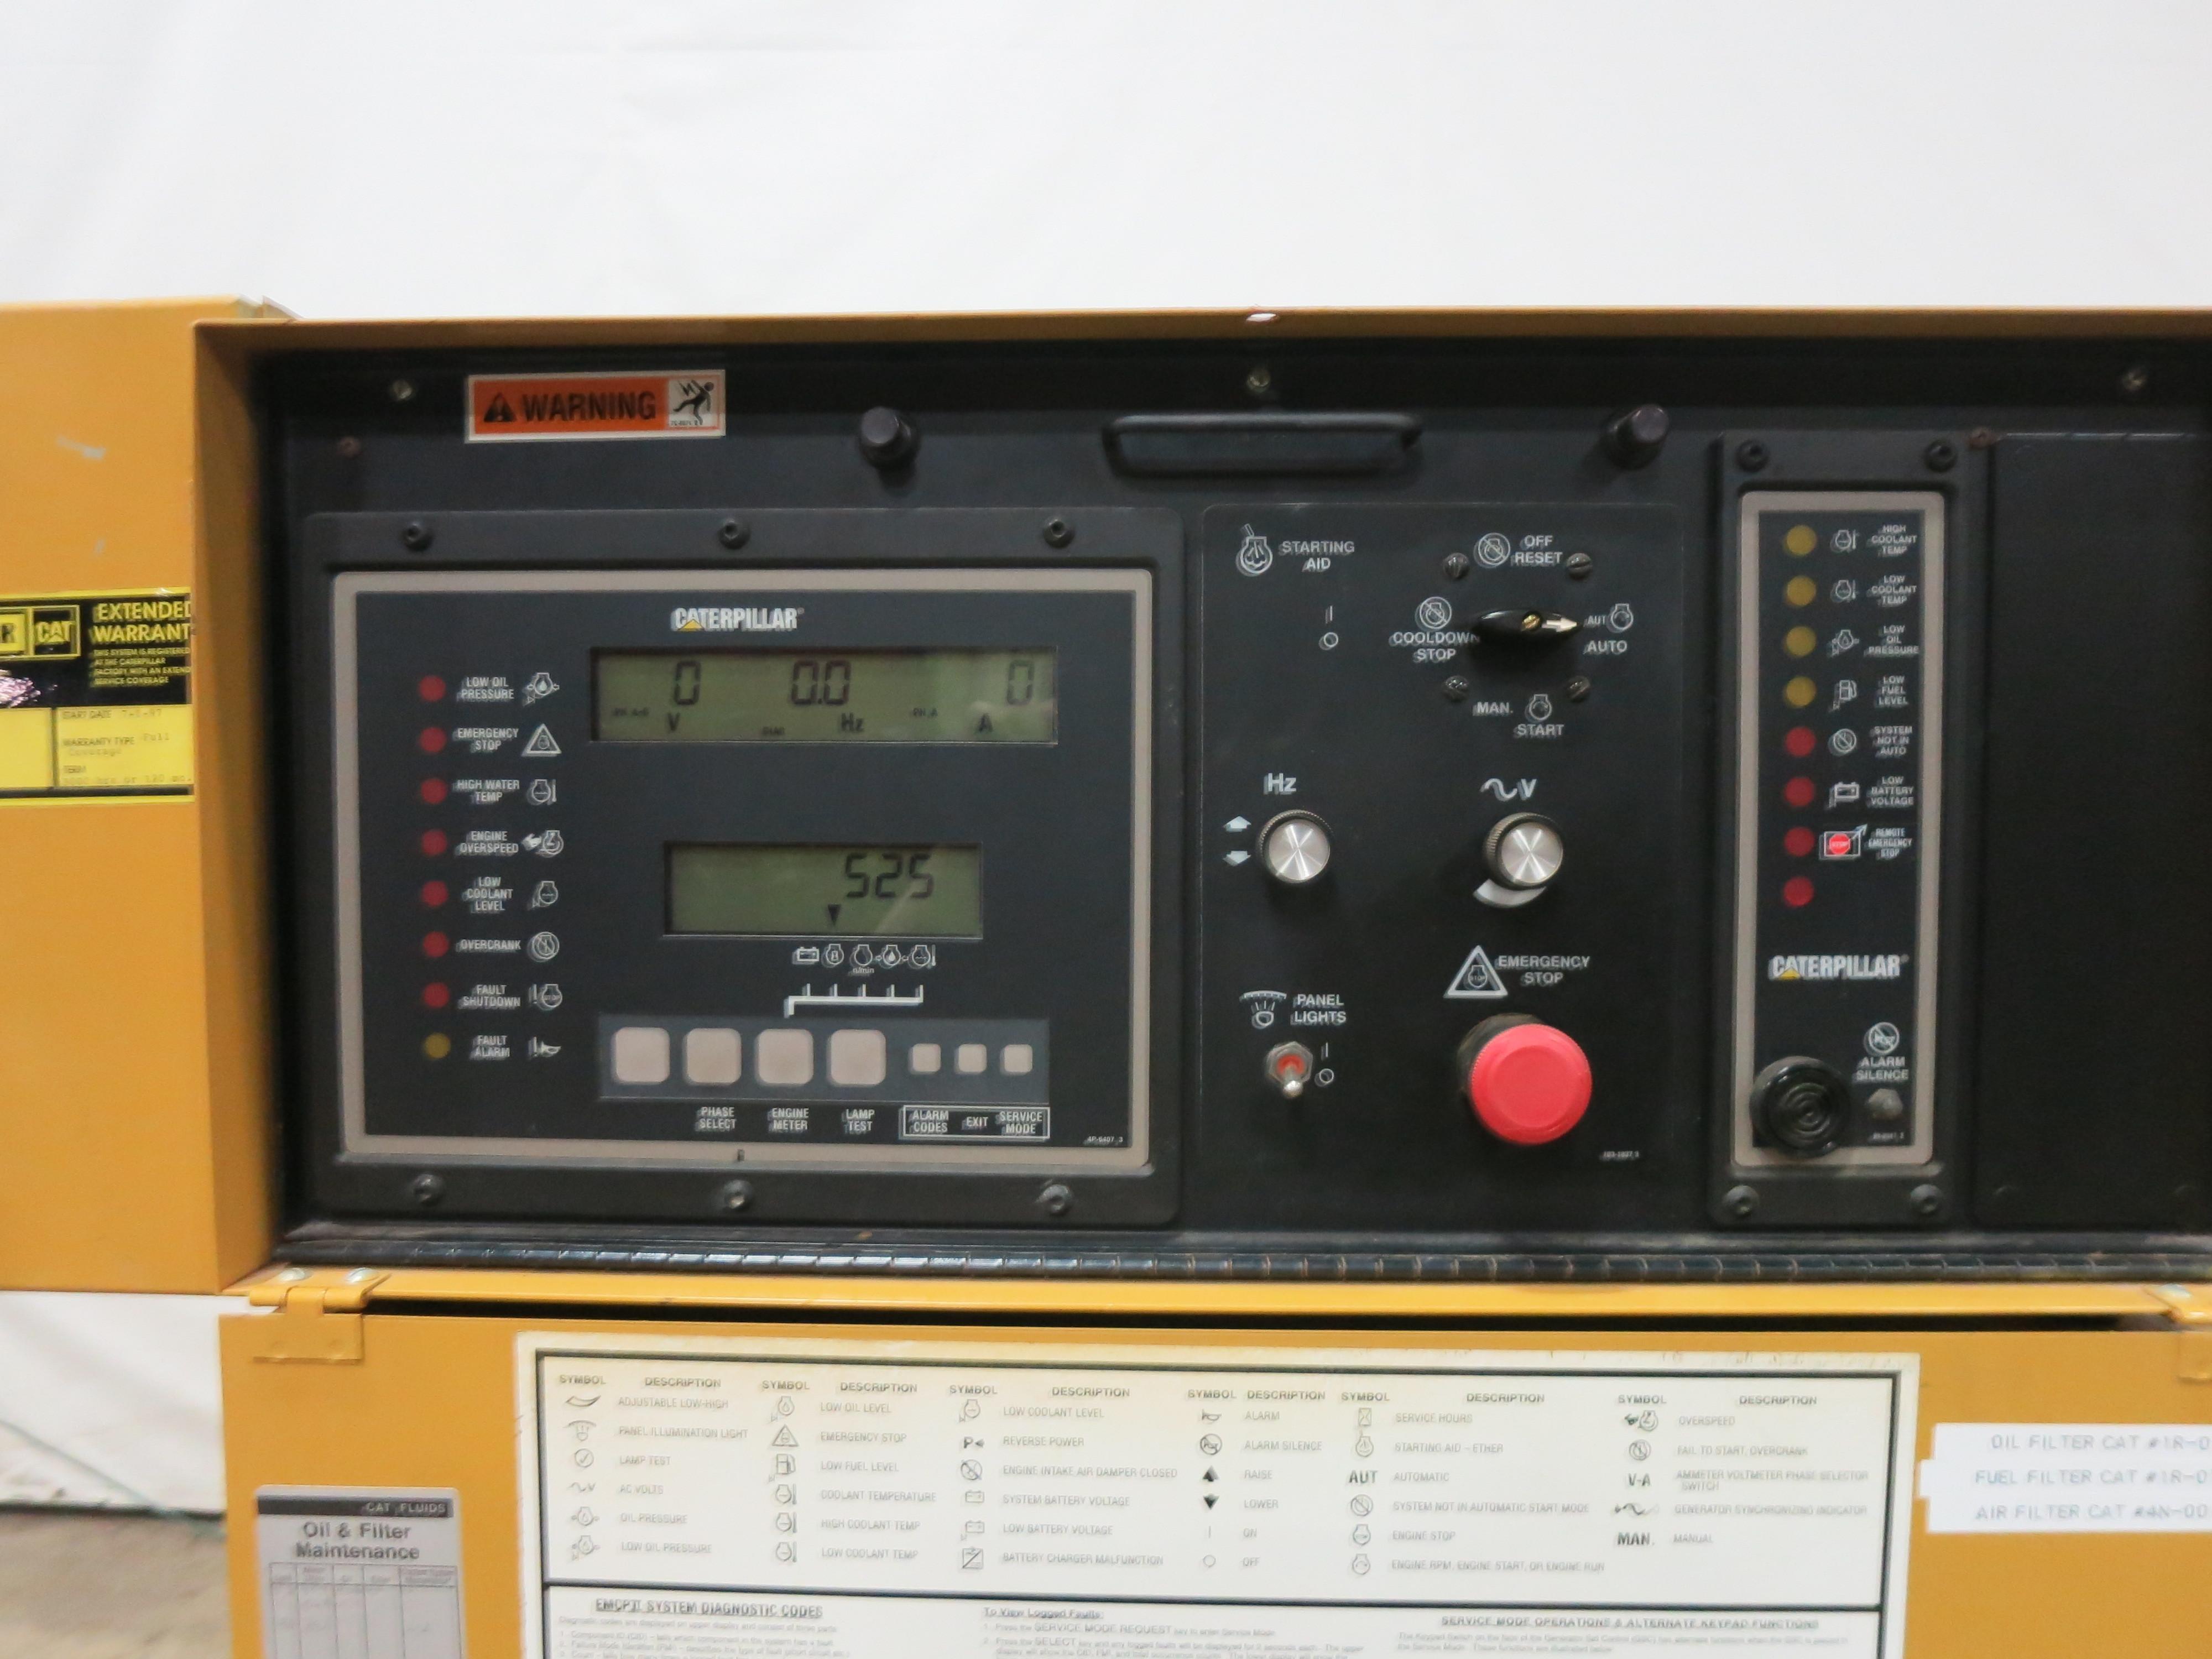 Used Caterpillar 3406 Diesel Generator, 525 Hrs